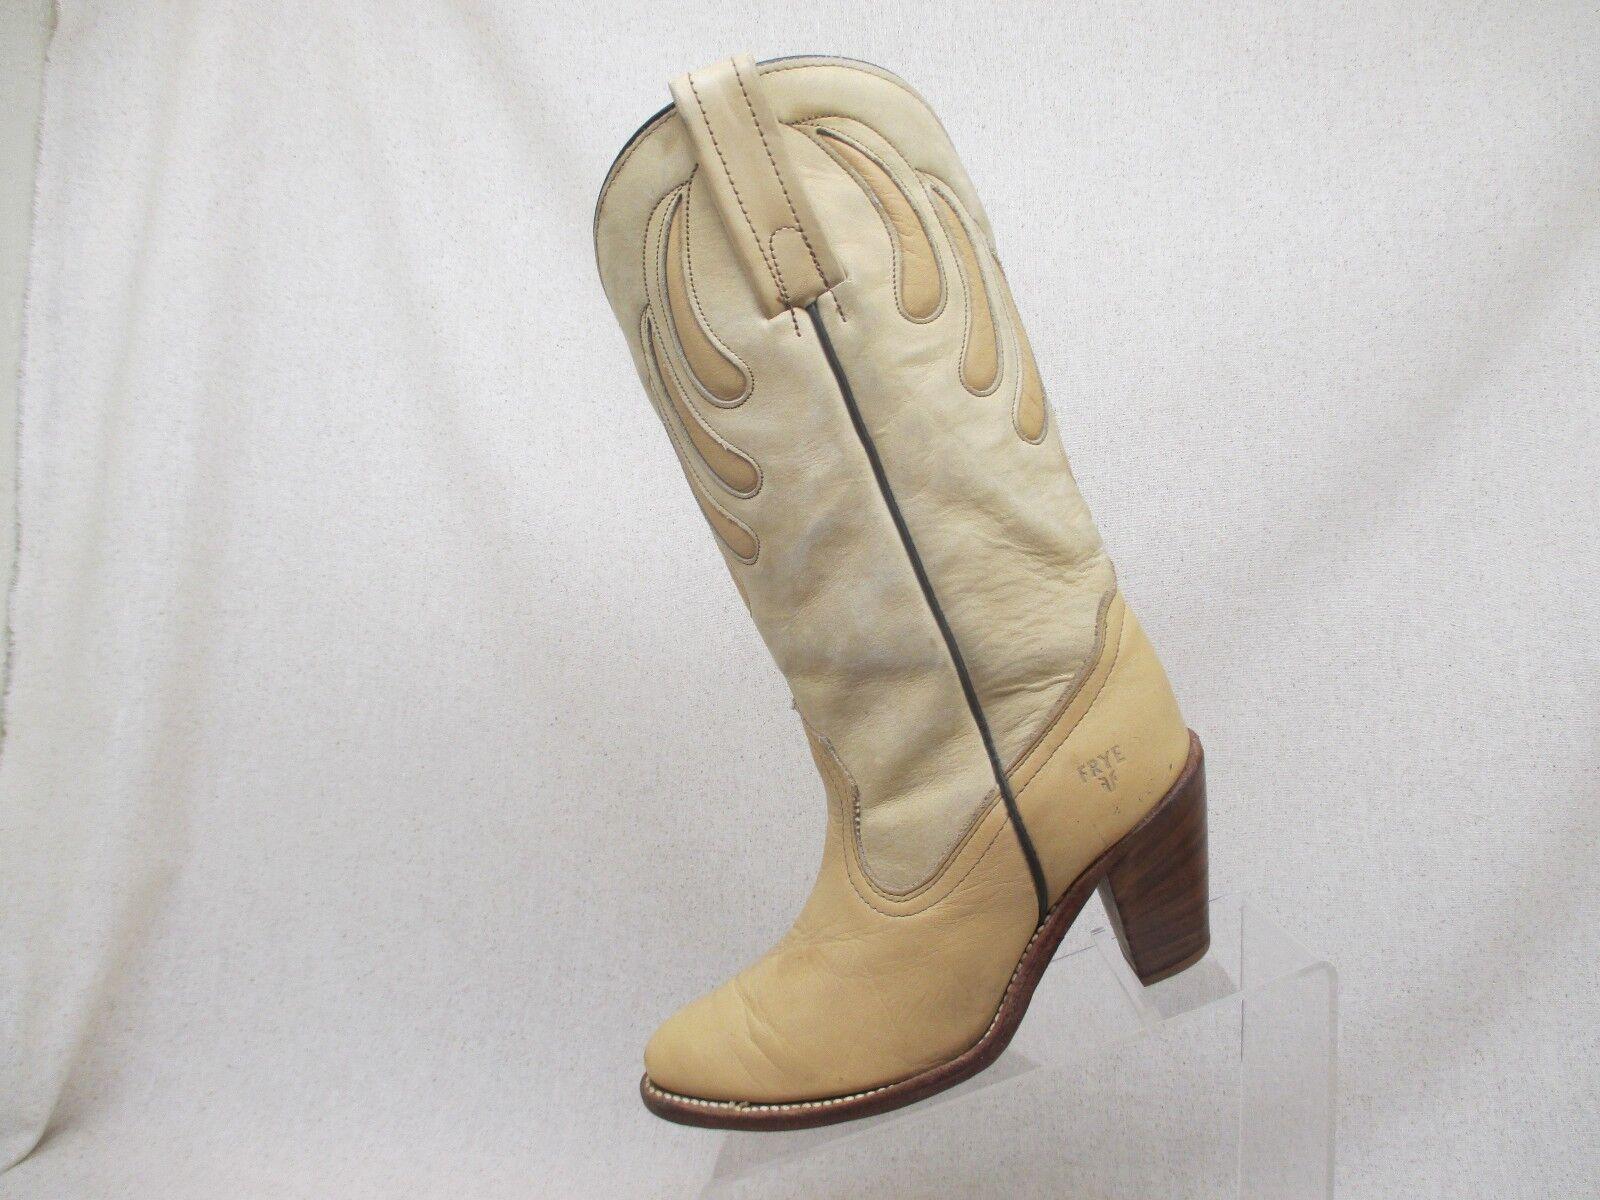 Frye Peach & Cream Leather Heeled Inlay Cowboy Western Boots Size 7 B N28266 USA